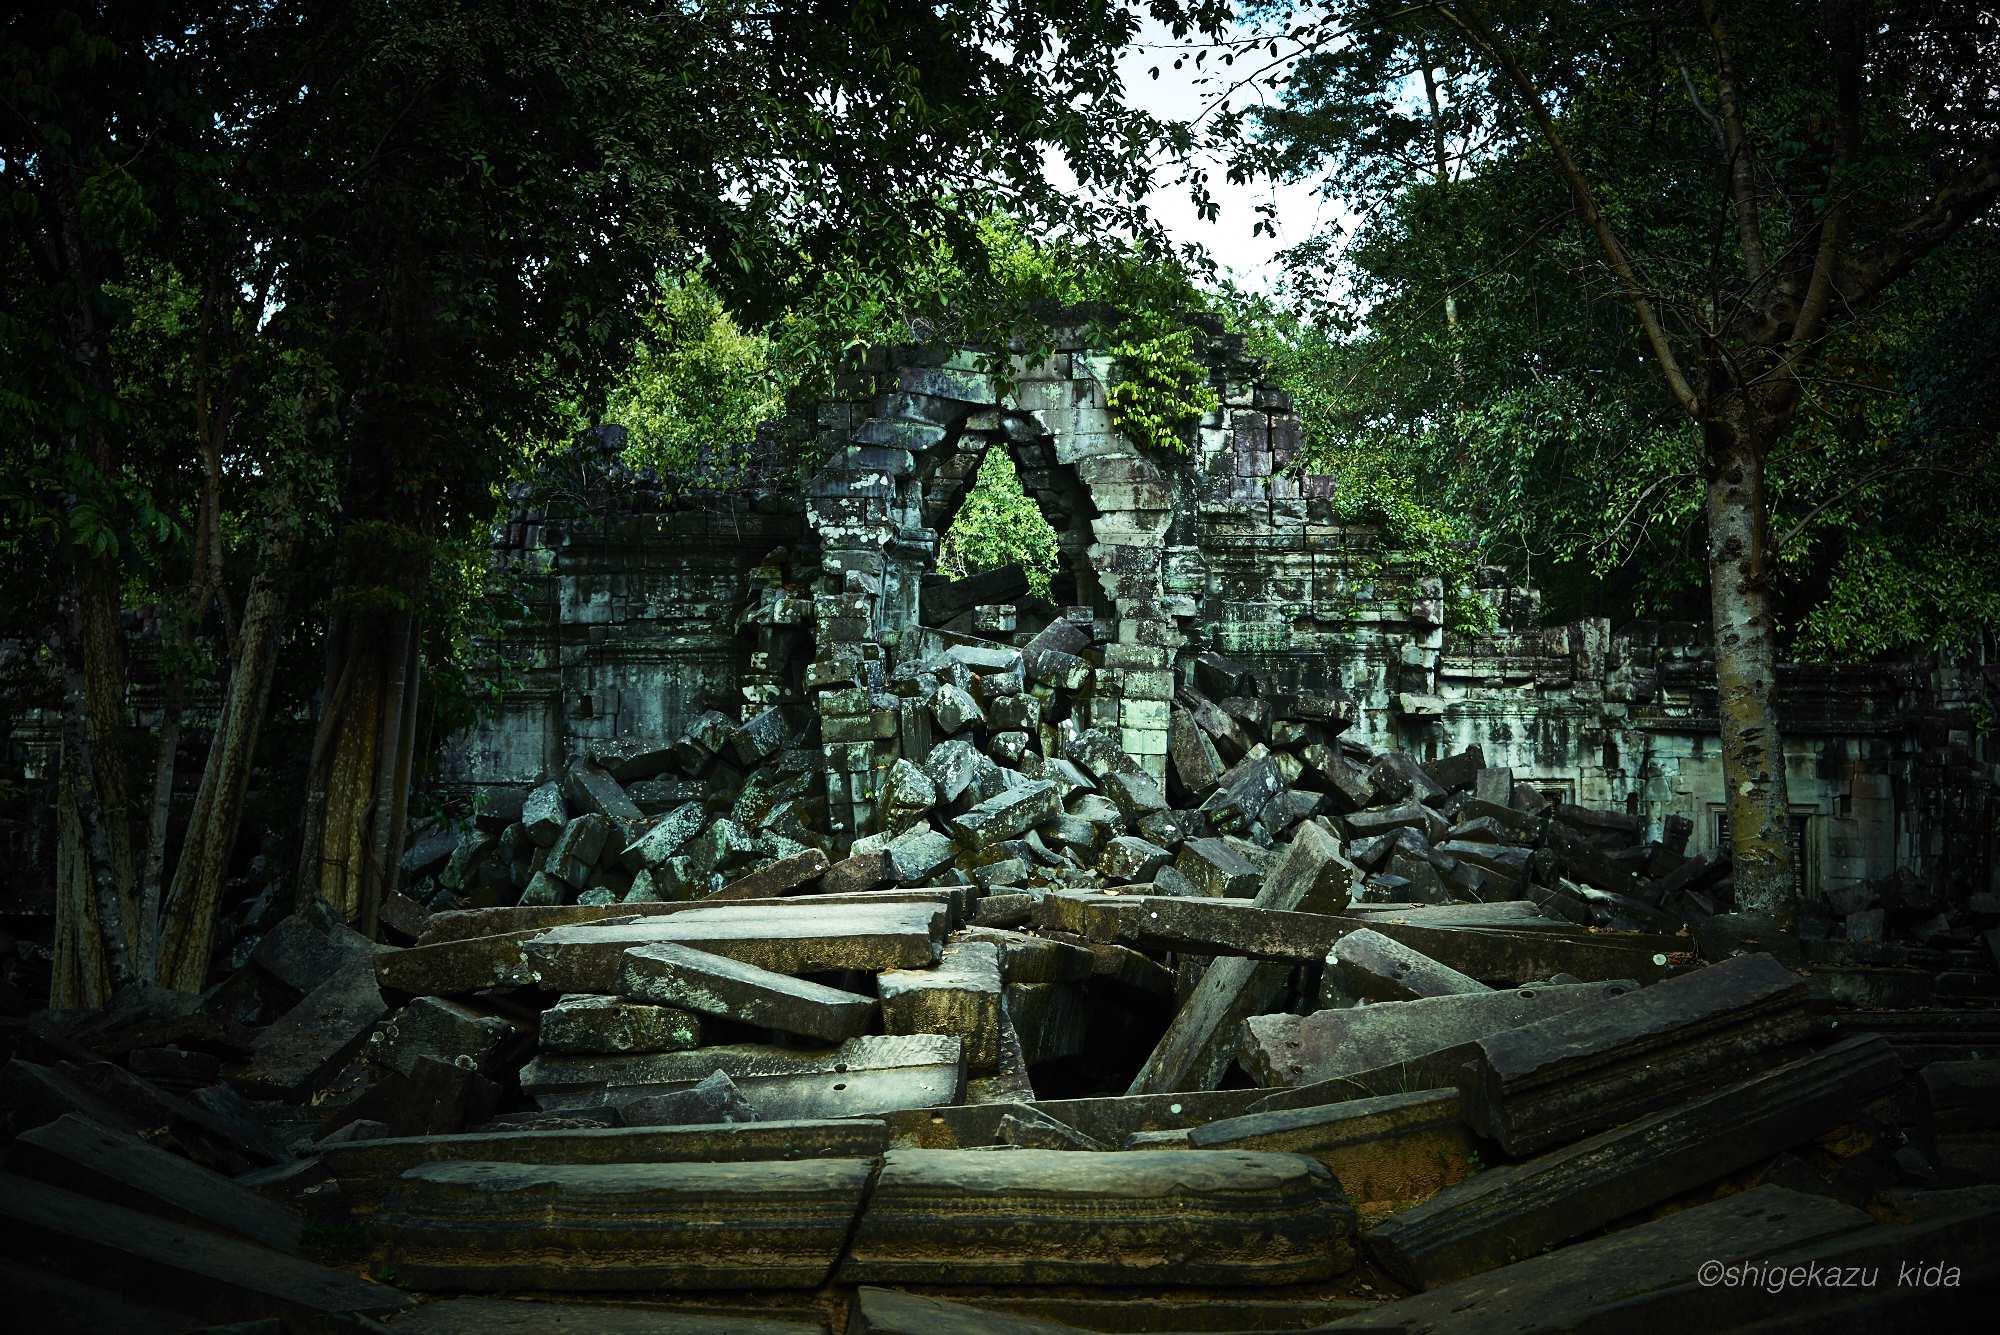 Angkor(アンコール)遺跡群にあるBengMealea(ベン・メリア)の崩壊した門